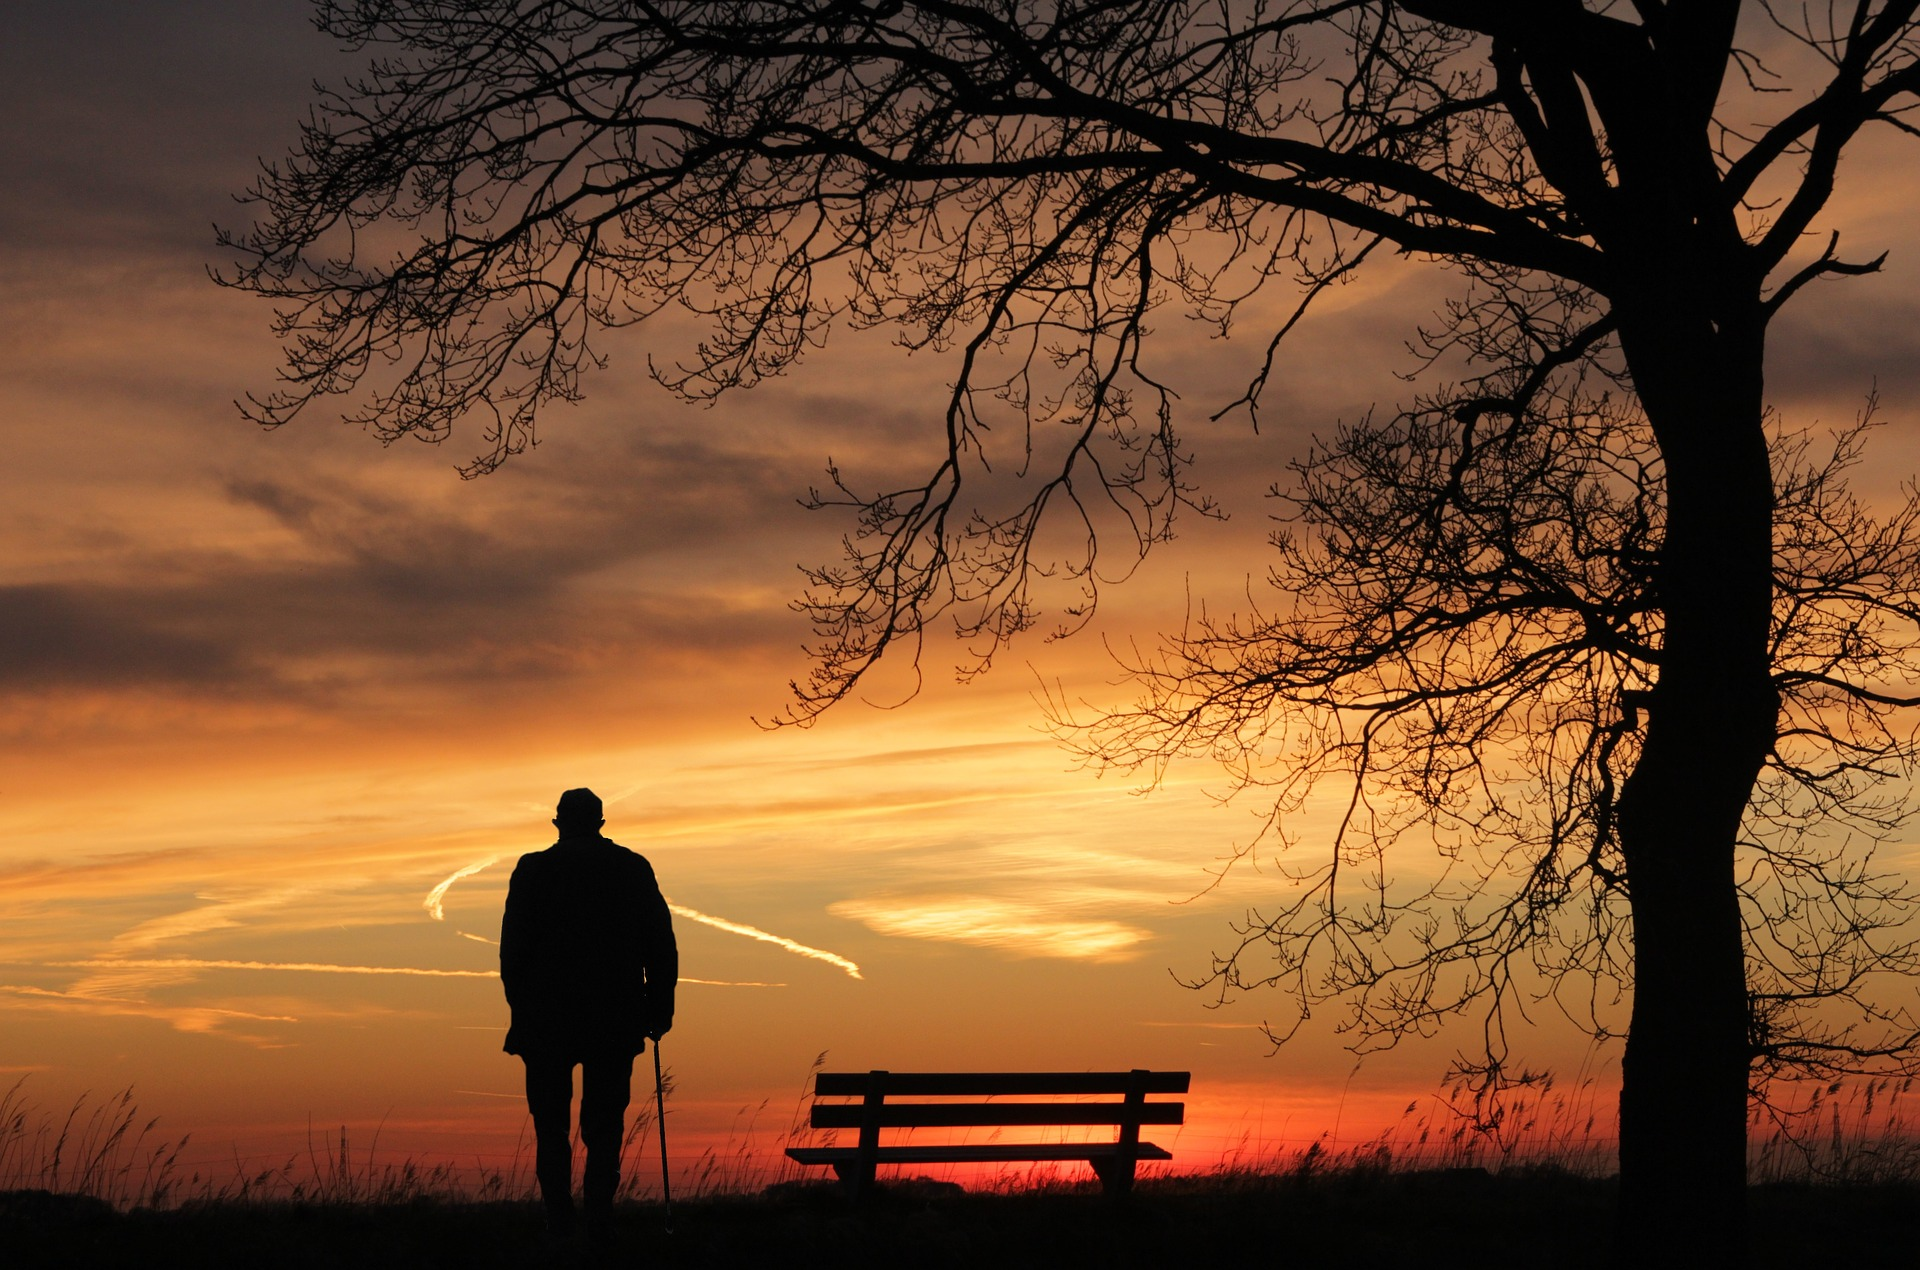 sunset-3156176_1920.jpg